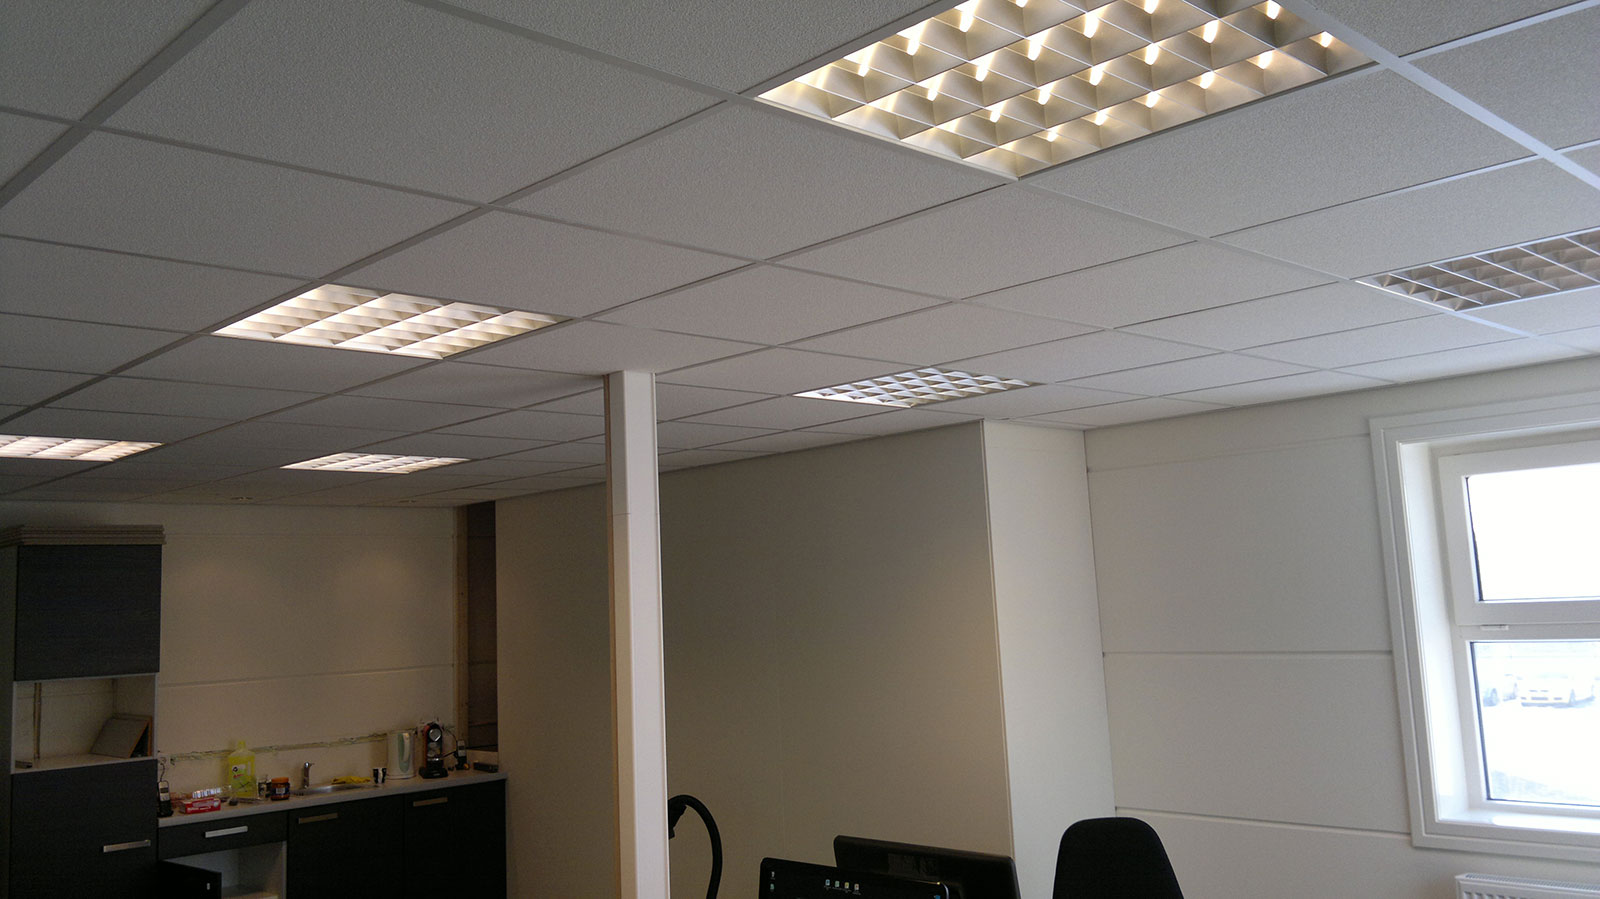 Verlichting op kantoor – M. Wouters Elektrotechniek